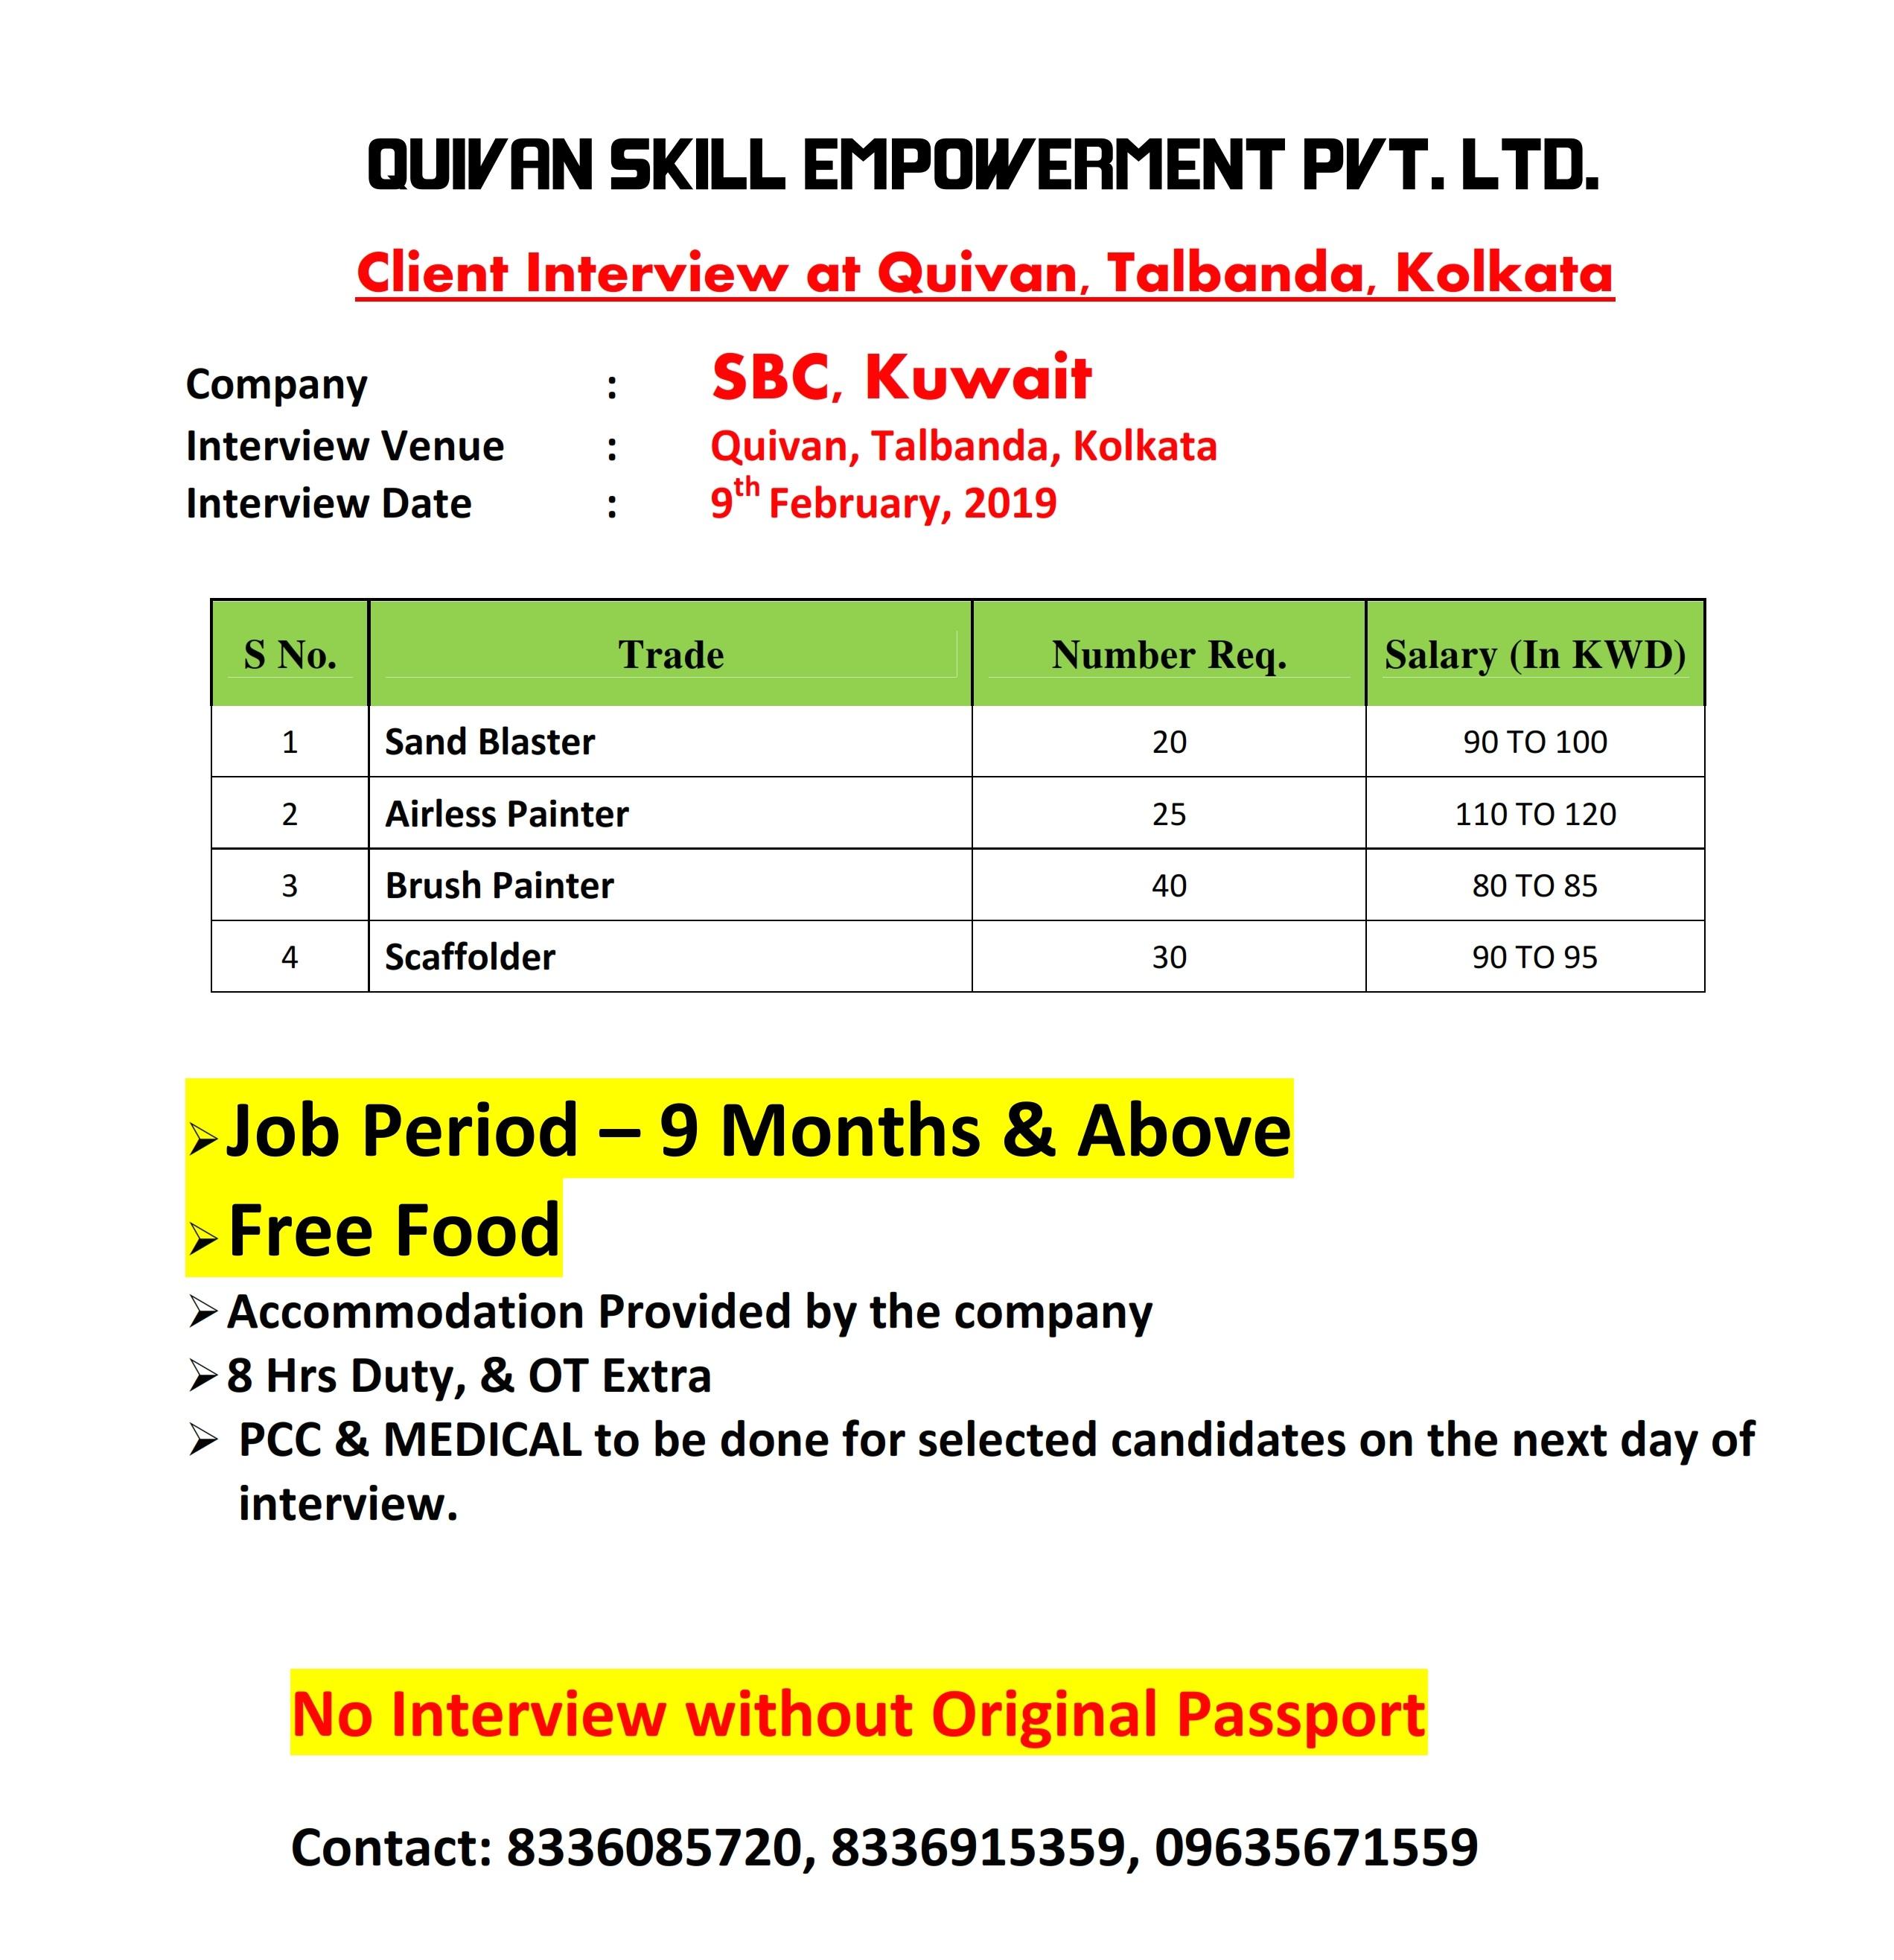 Quivan Skill Empowerment